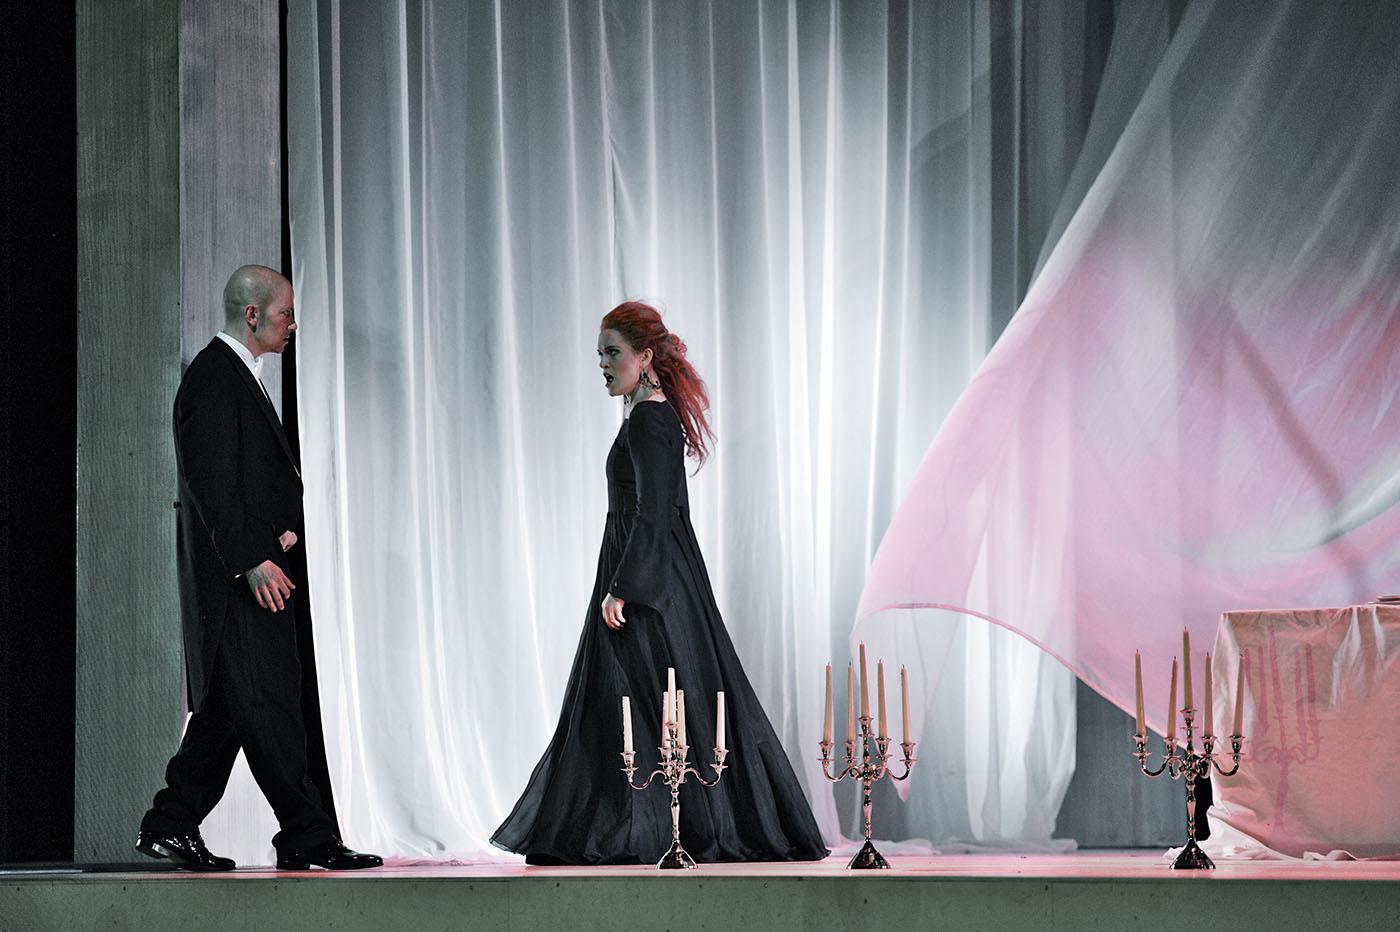 Handel/Telemann Otto Le concert Lorraine